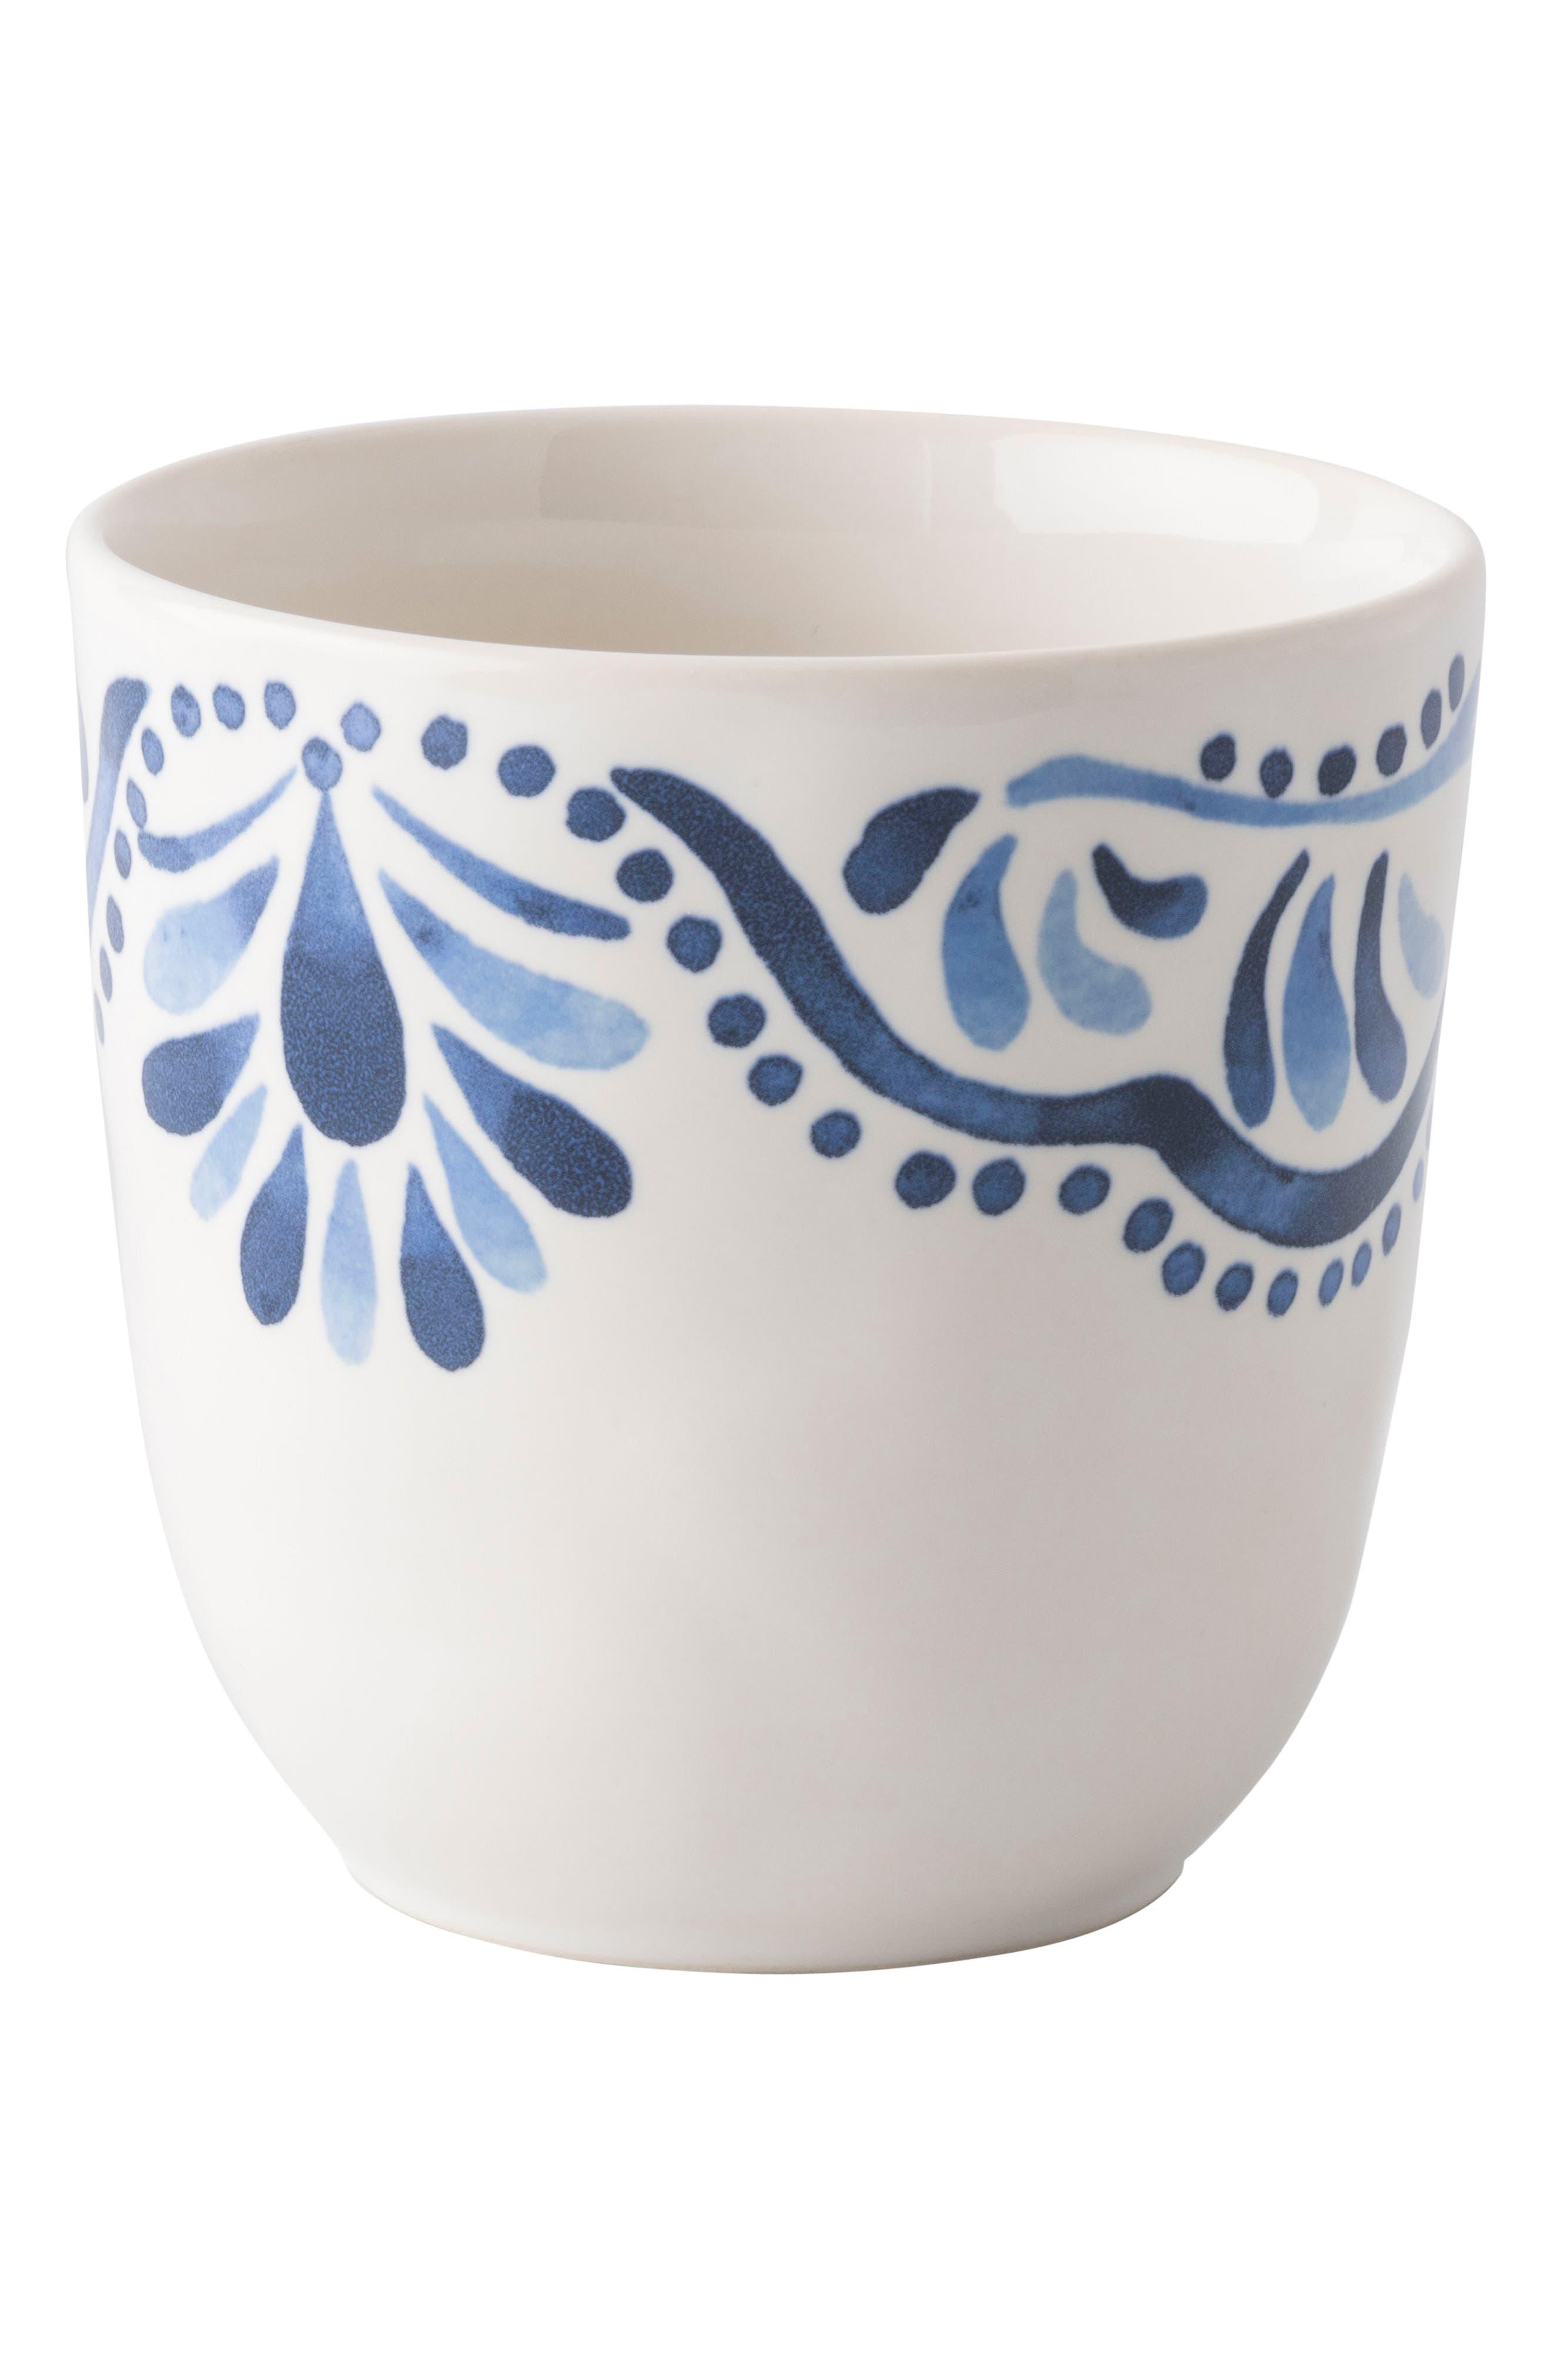 Alternate Image 1 Selected - Juliska Wanderlust Collection - Iberian Journey Ceramic Coffee/Tea Cup